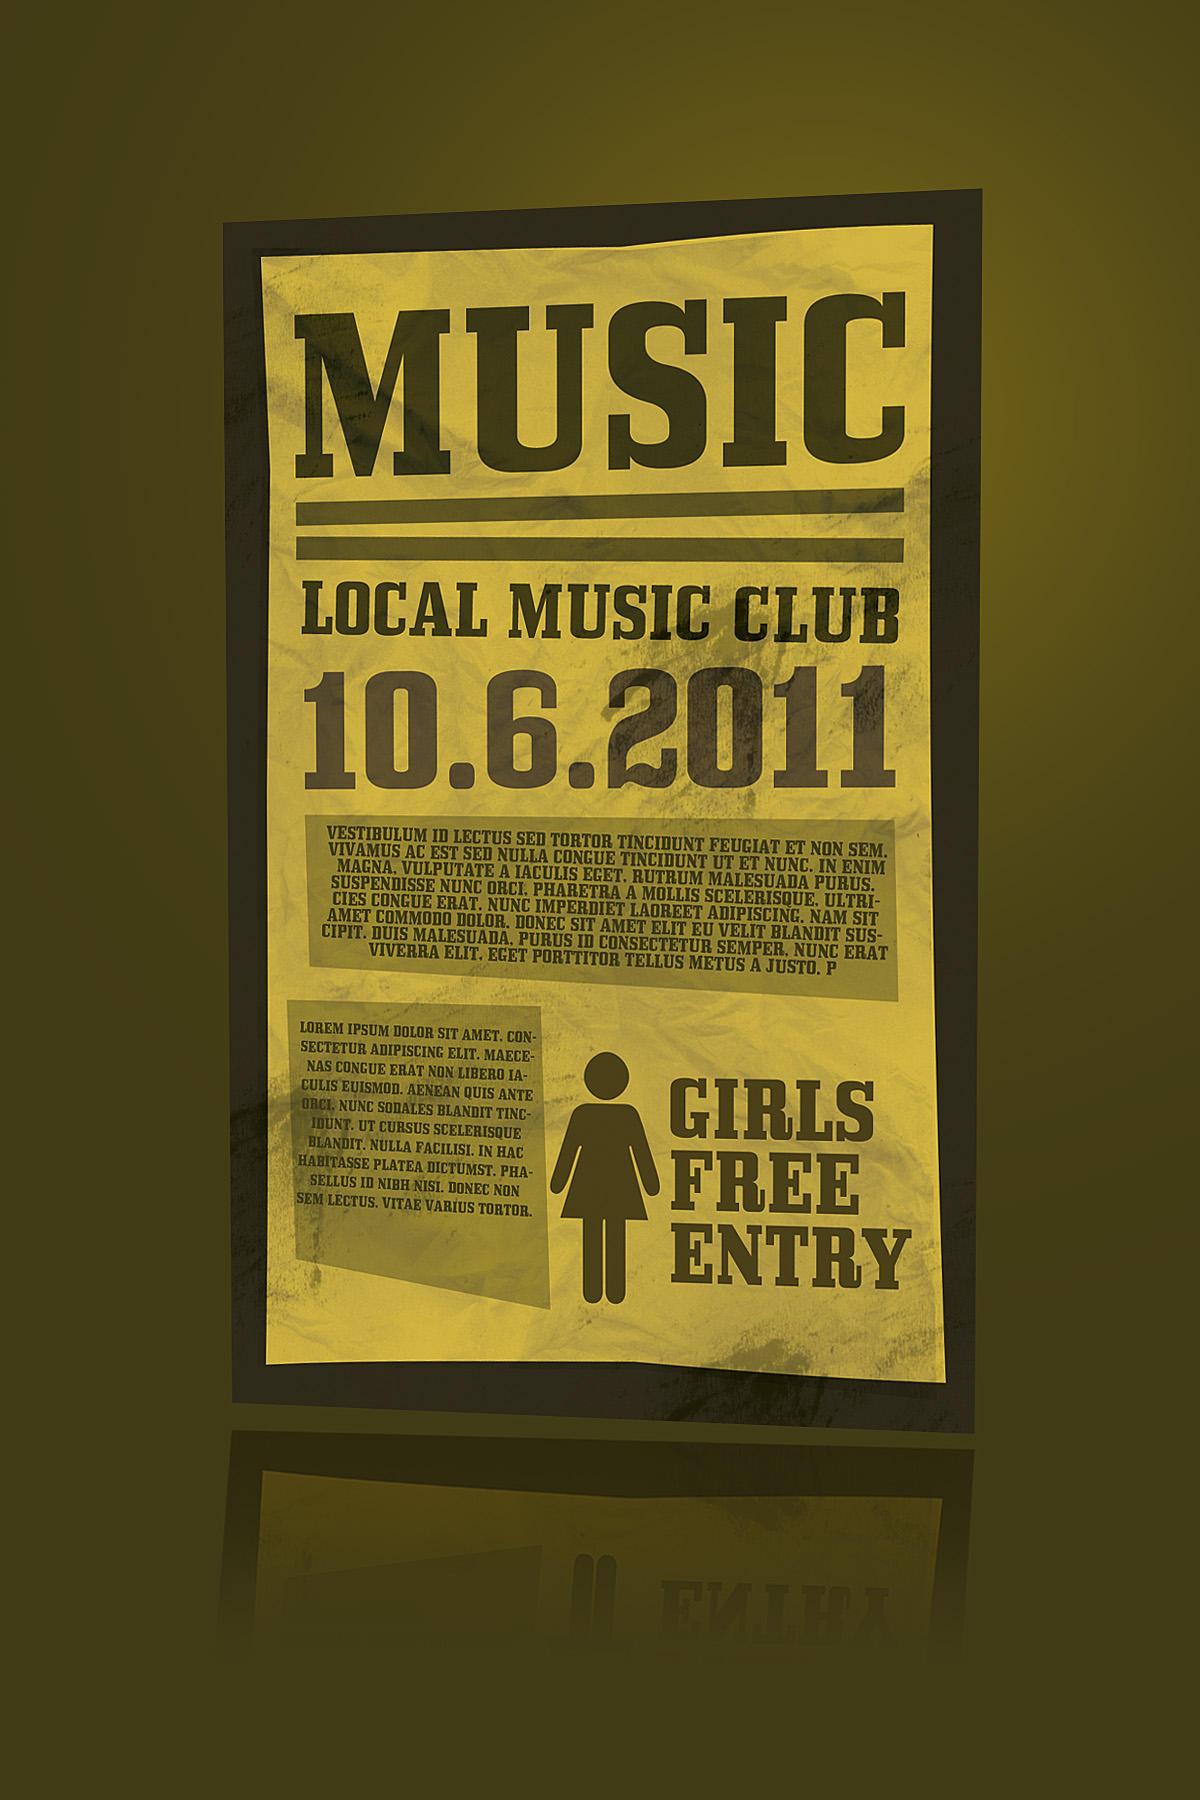 Music flyer psd by martz90 on deviantart music flyer psd by martz90 music flyer psd by martz90 saigontimesfo